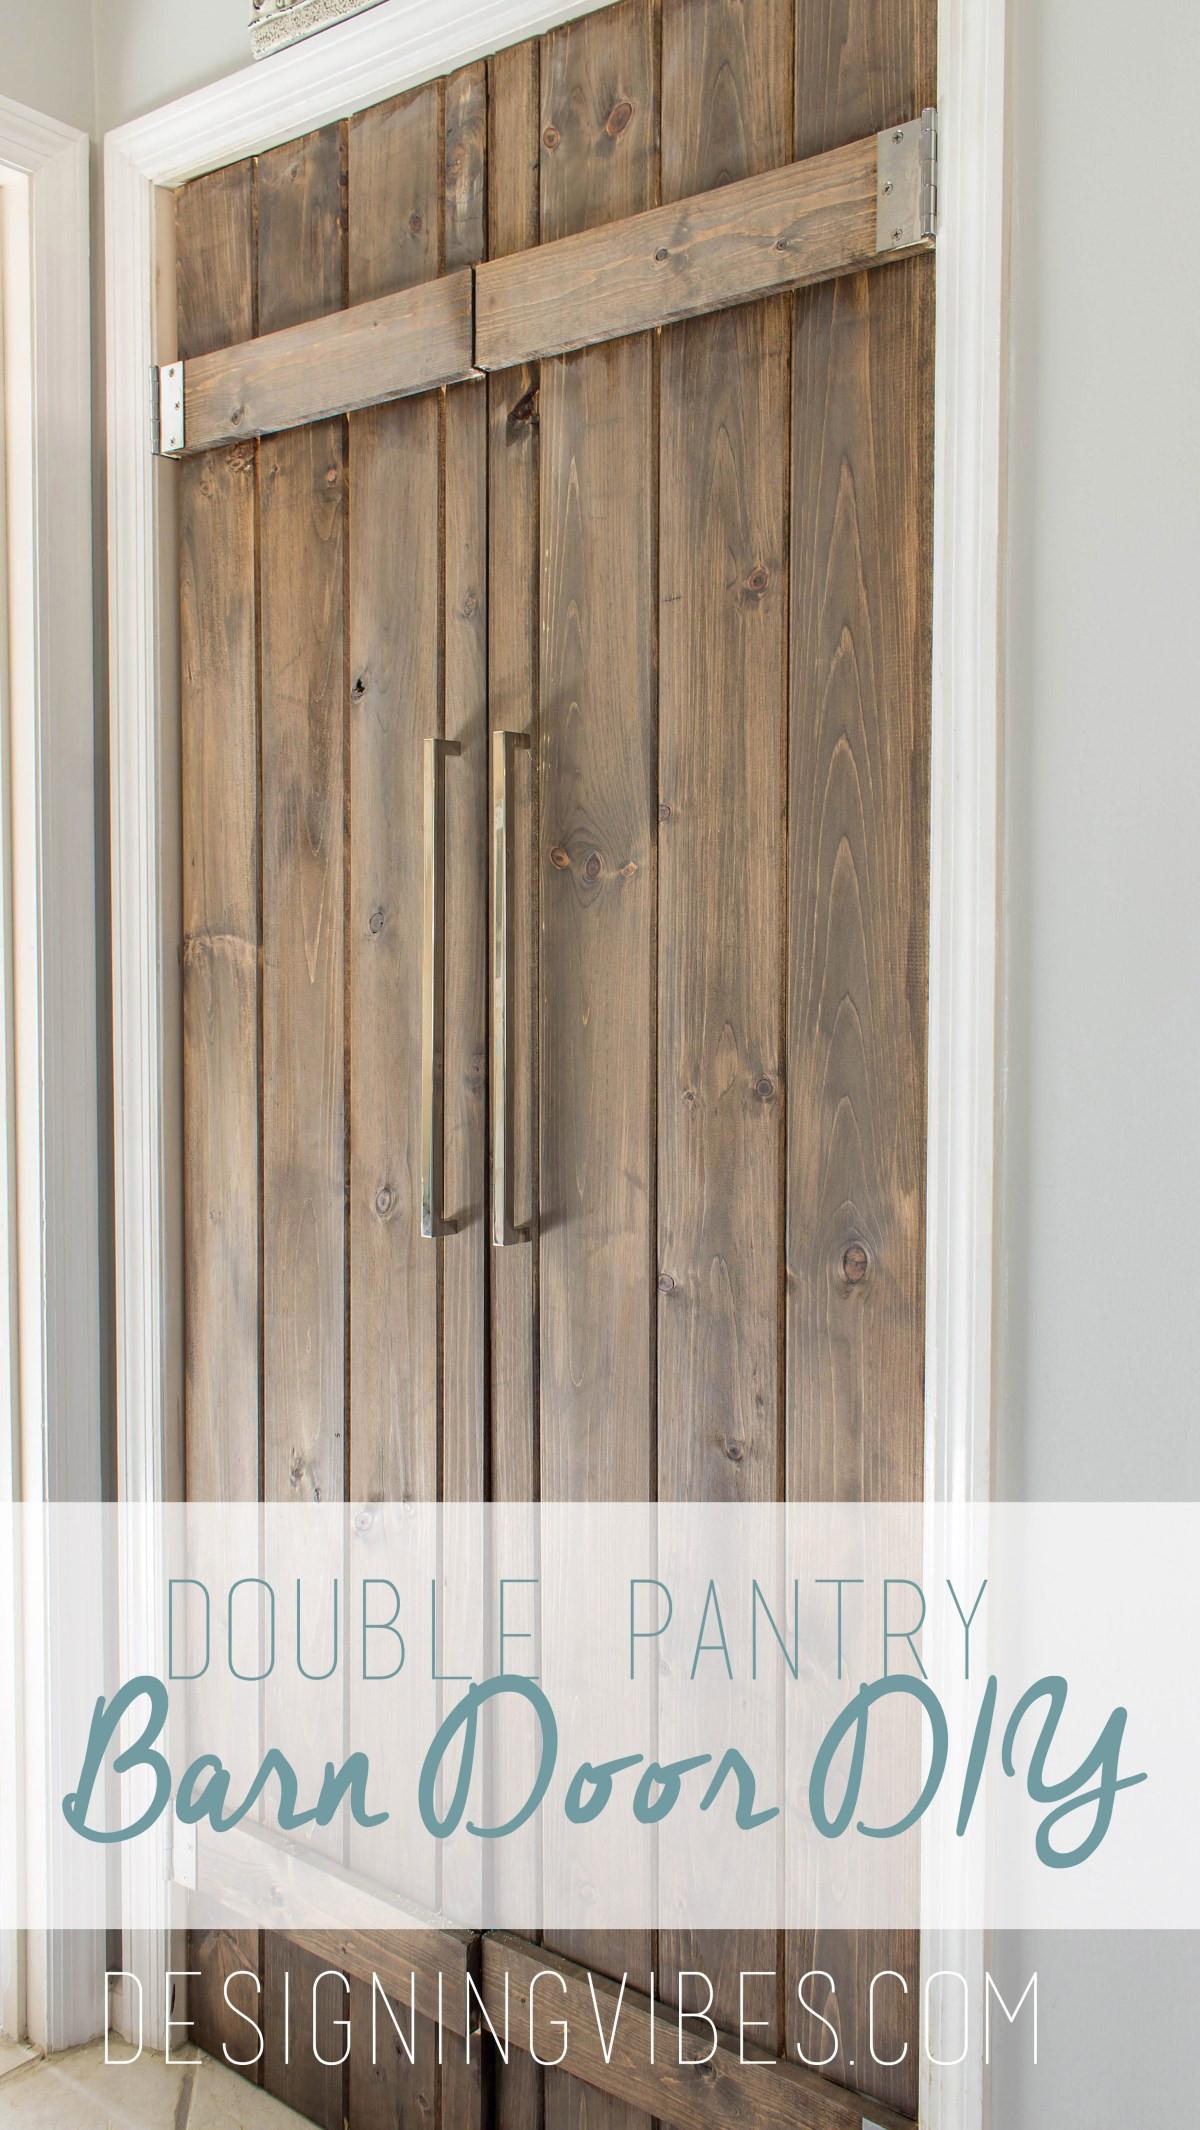 Best ideas about DIY Wood Doors . Save or Pin Double Pantry Barn Door DIY Under $90 Now.